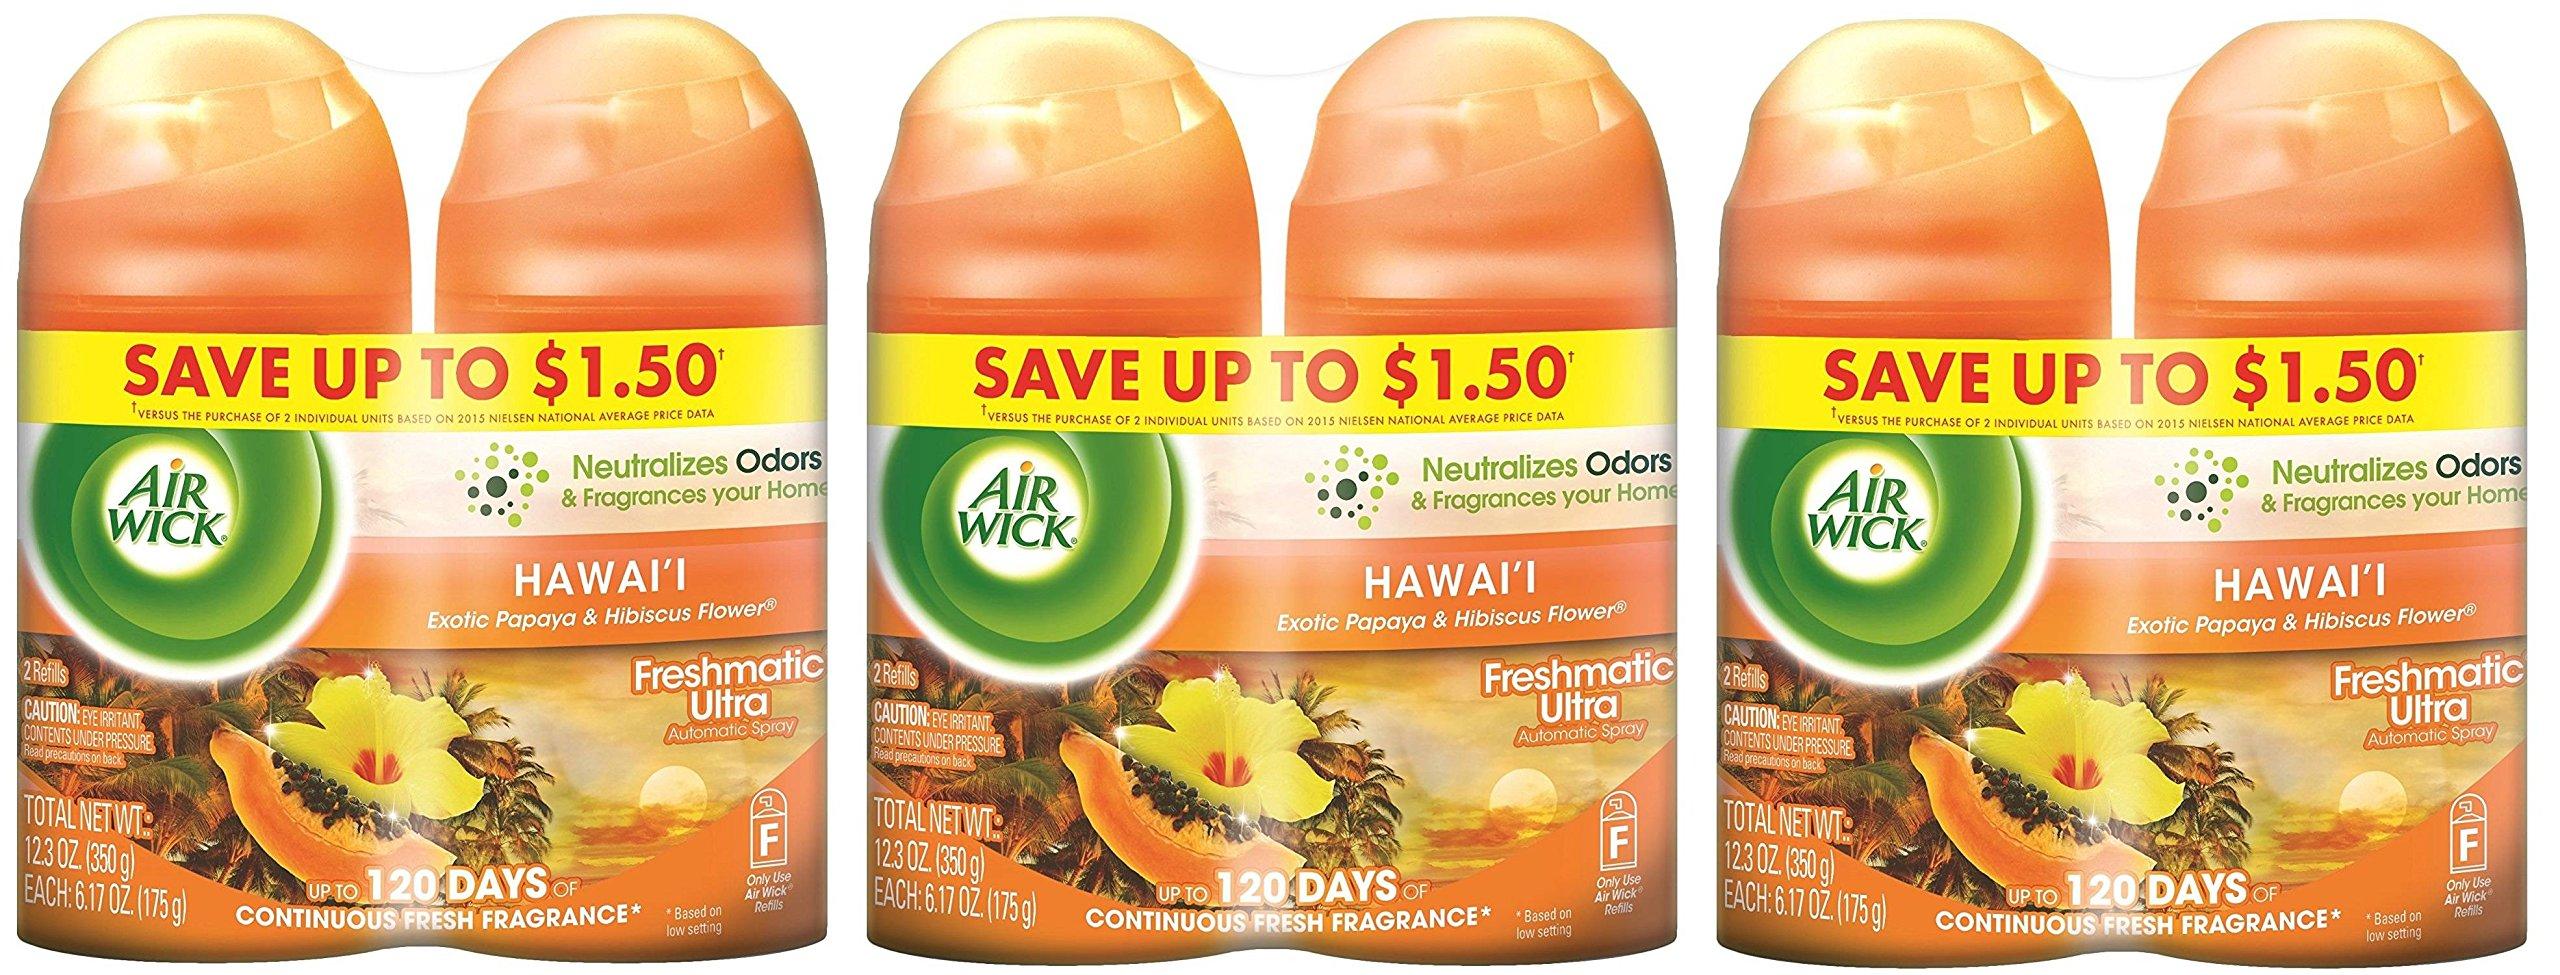 Air Wick Freshmatic Automatic Spray Refill Air Freshener IjLftL, 2 Refills, 12.34oz, 3 Pack (Hawaii)